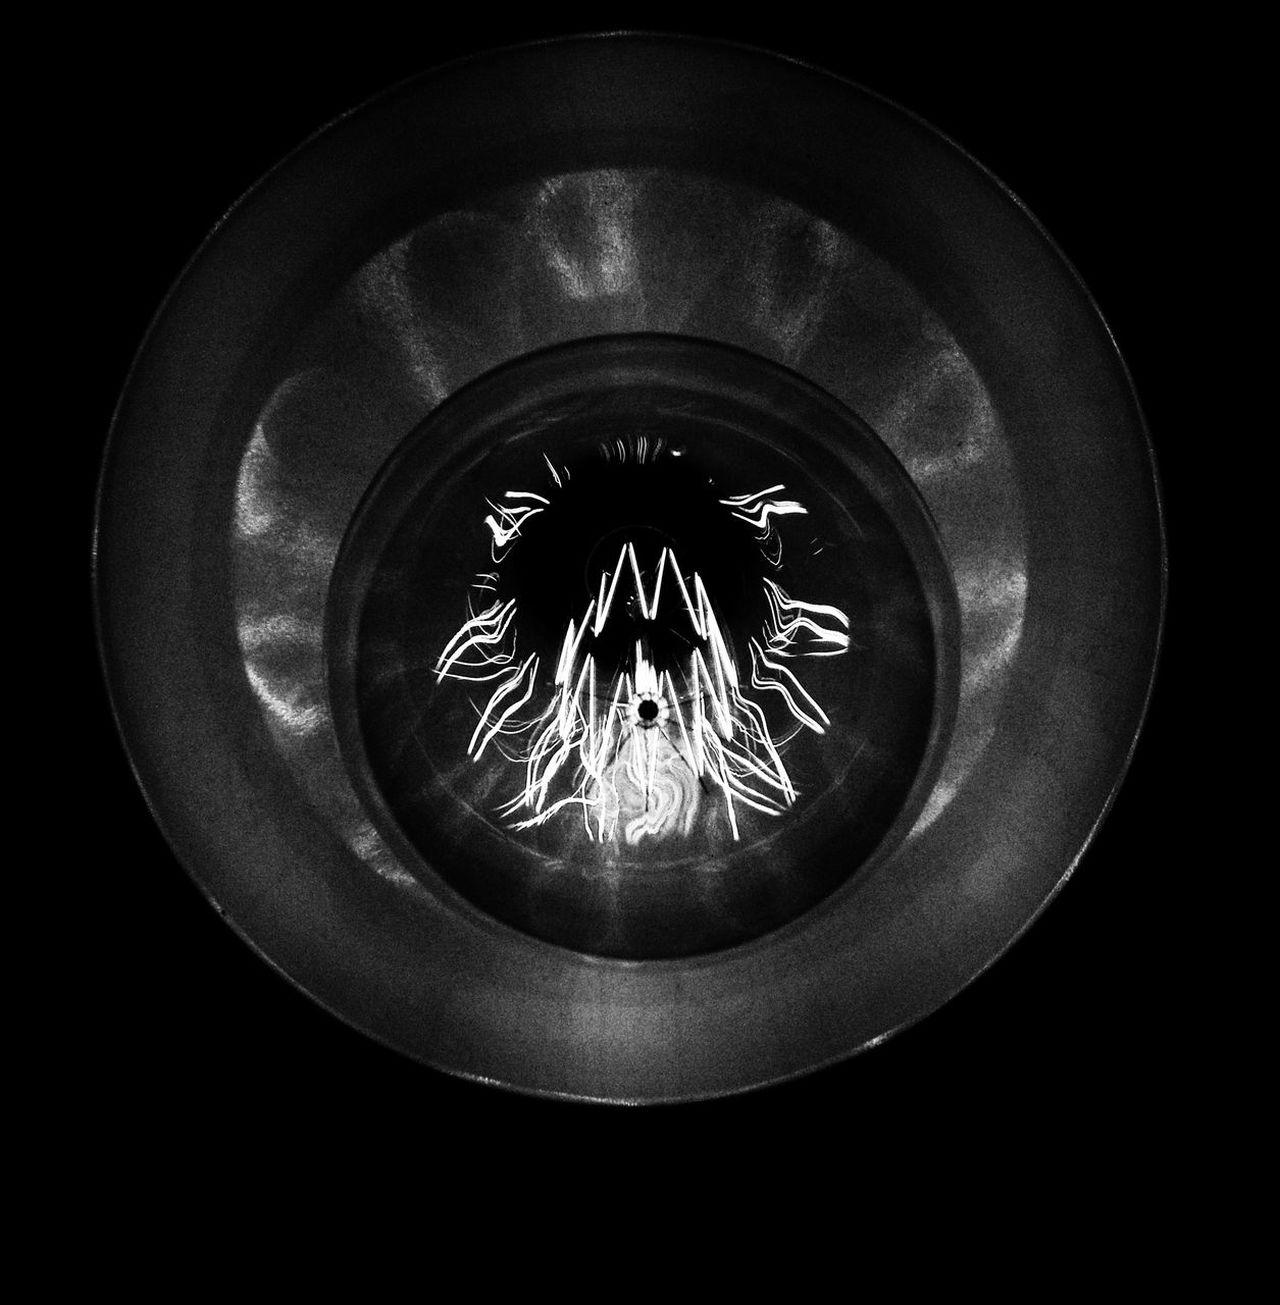 No People Illuminated Contrast Darkness And Light Photooftheday Lightanddarkness Black And White Blackandwhite Edisonlamp